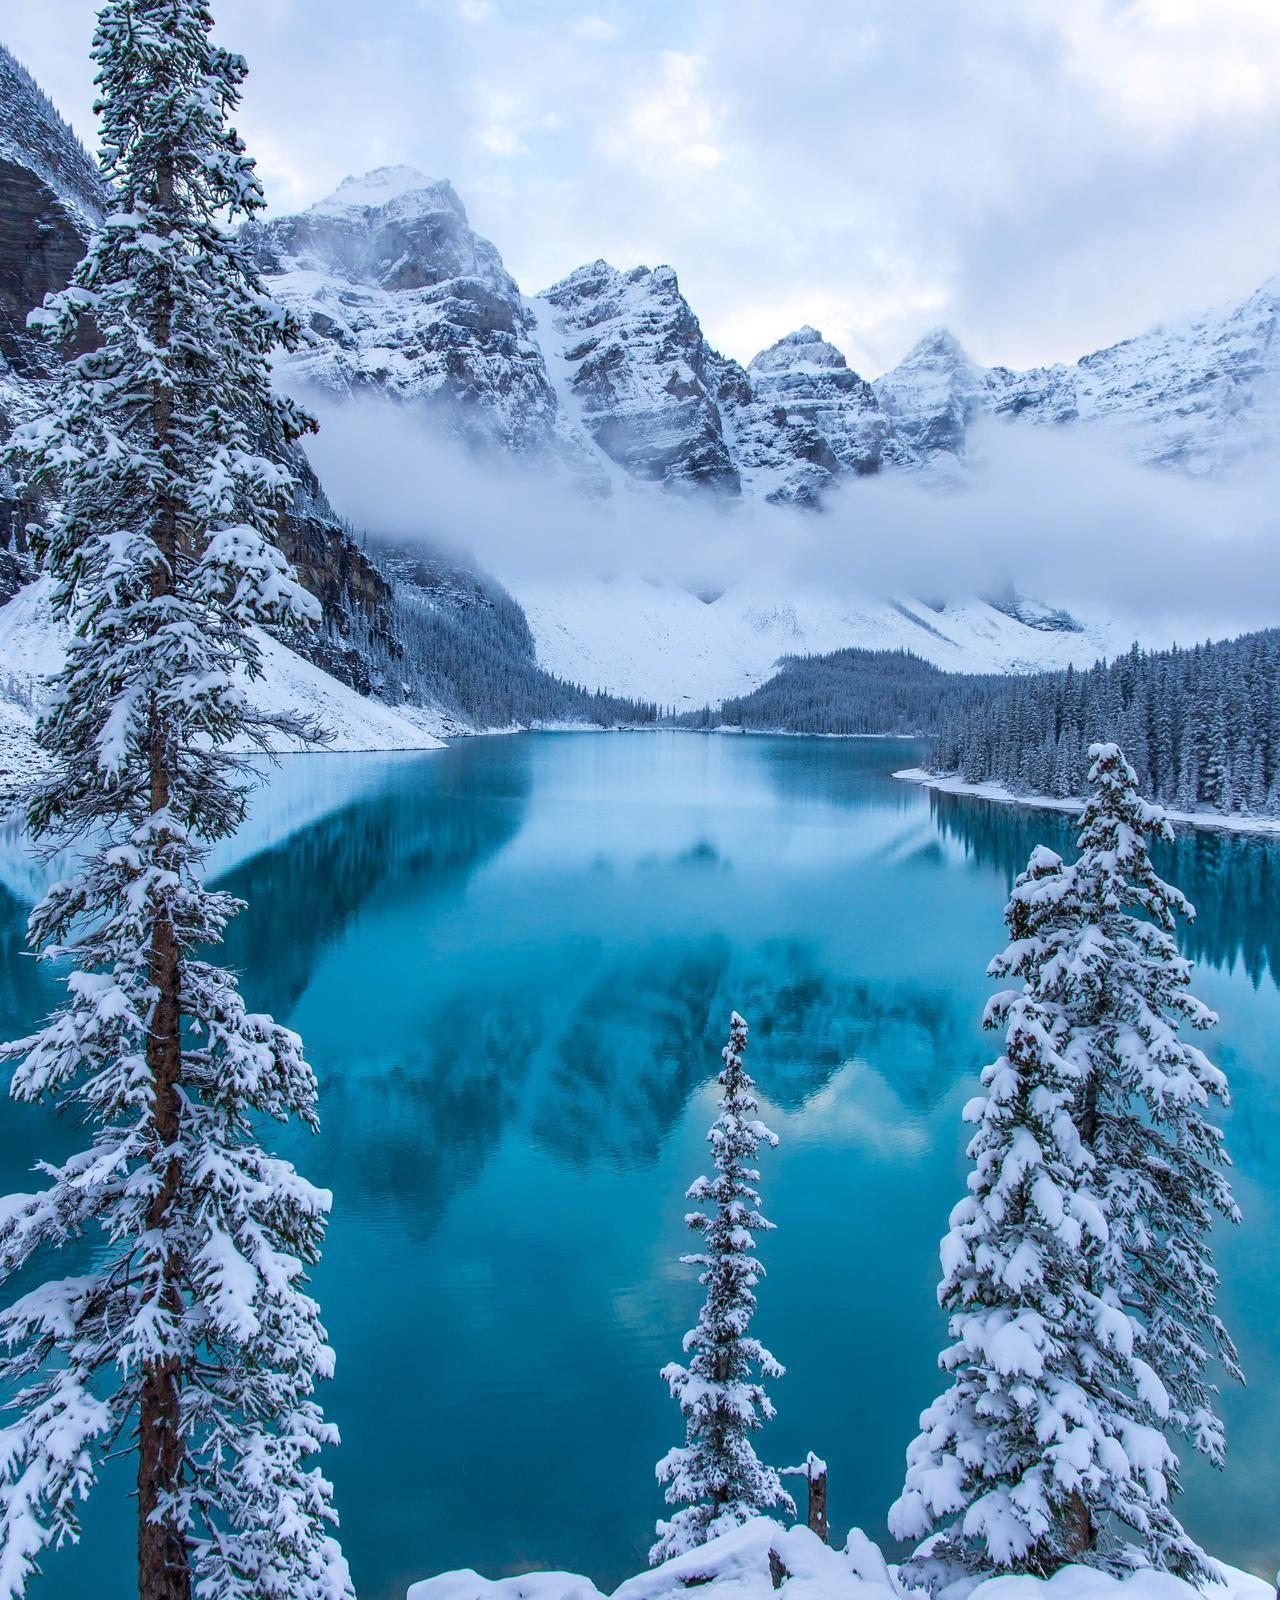 25 Must Follow Tumblr Photography Blogs Winter Landscape Winter Scenery Winter Nature